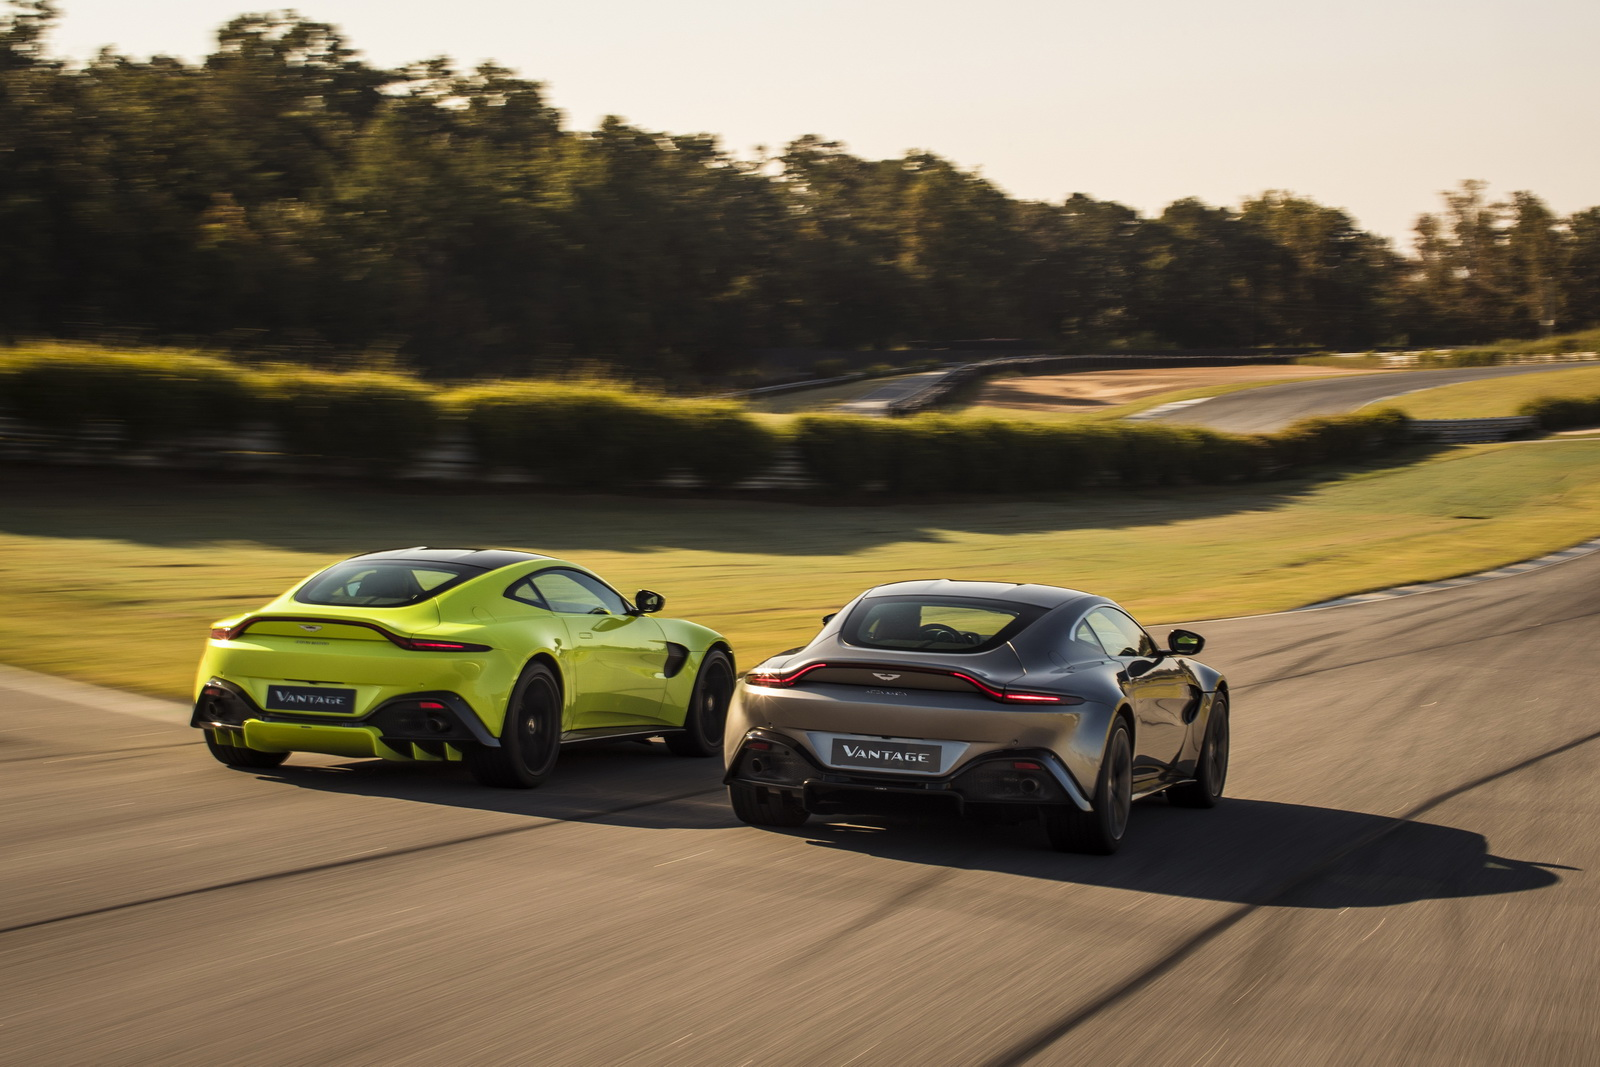 Aston Martin Actually Designed The New Vantage Before Bond